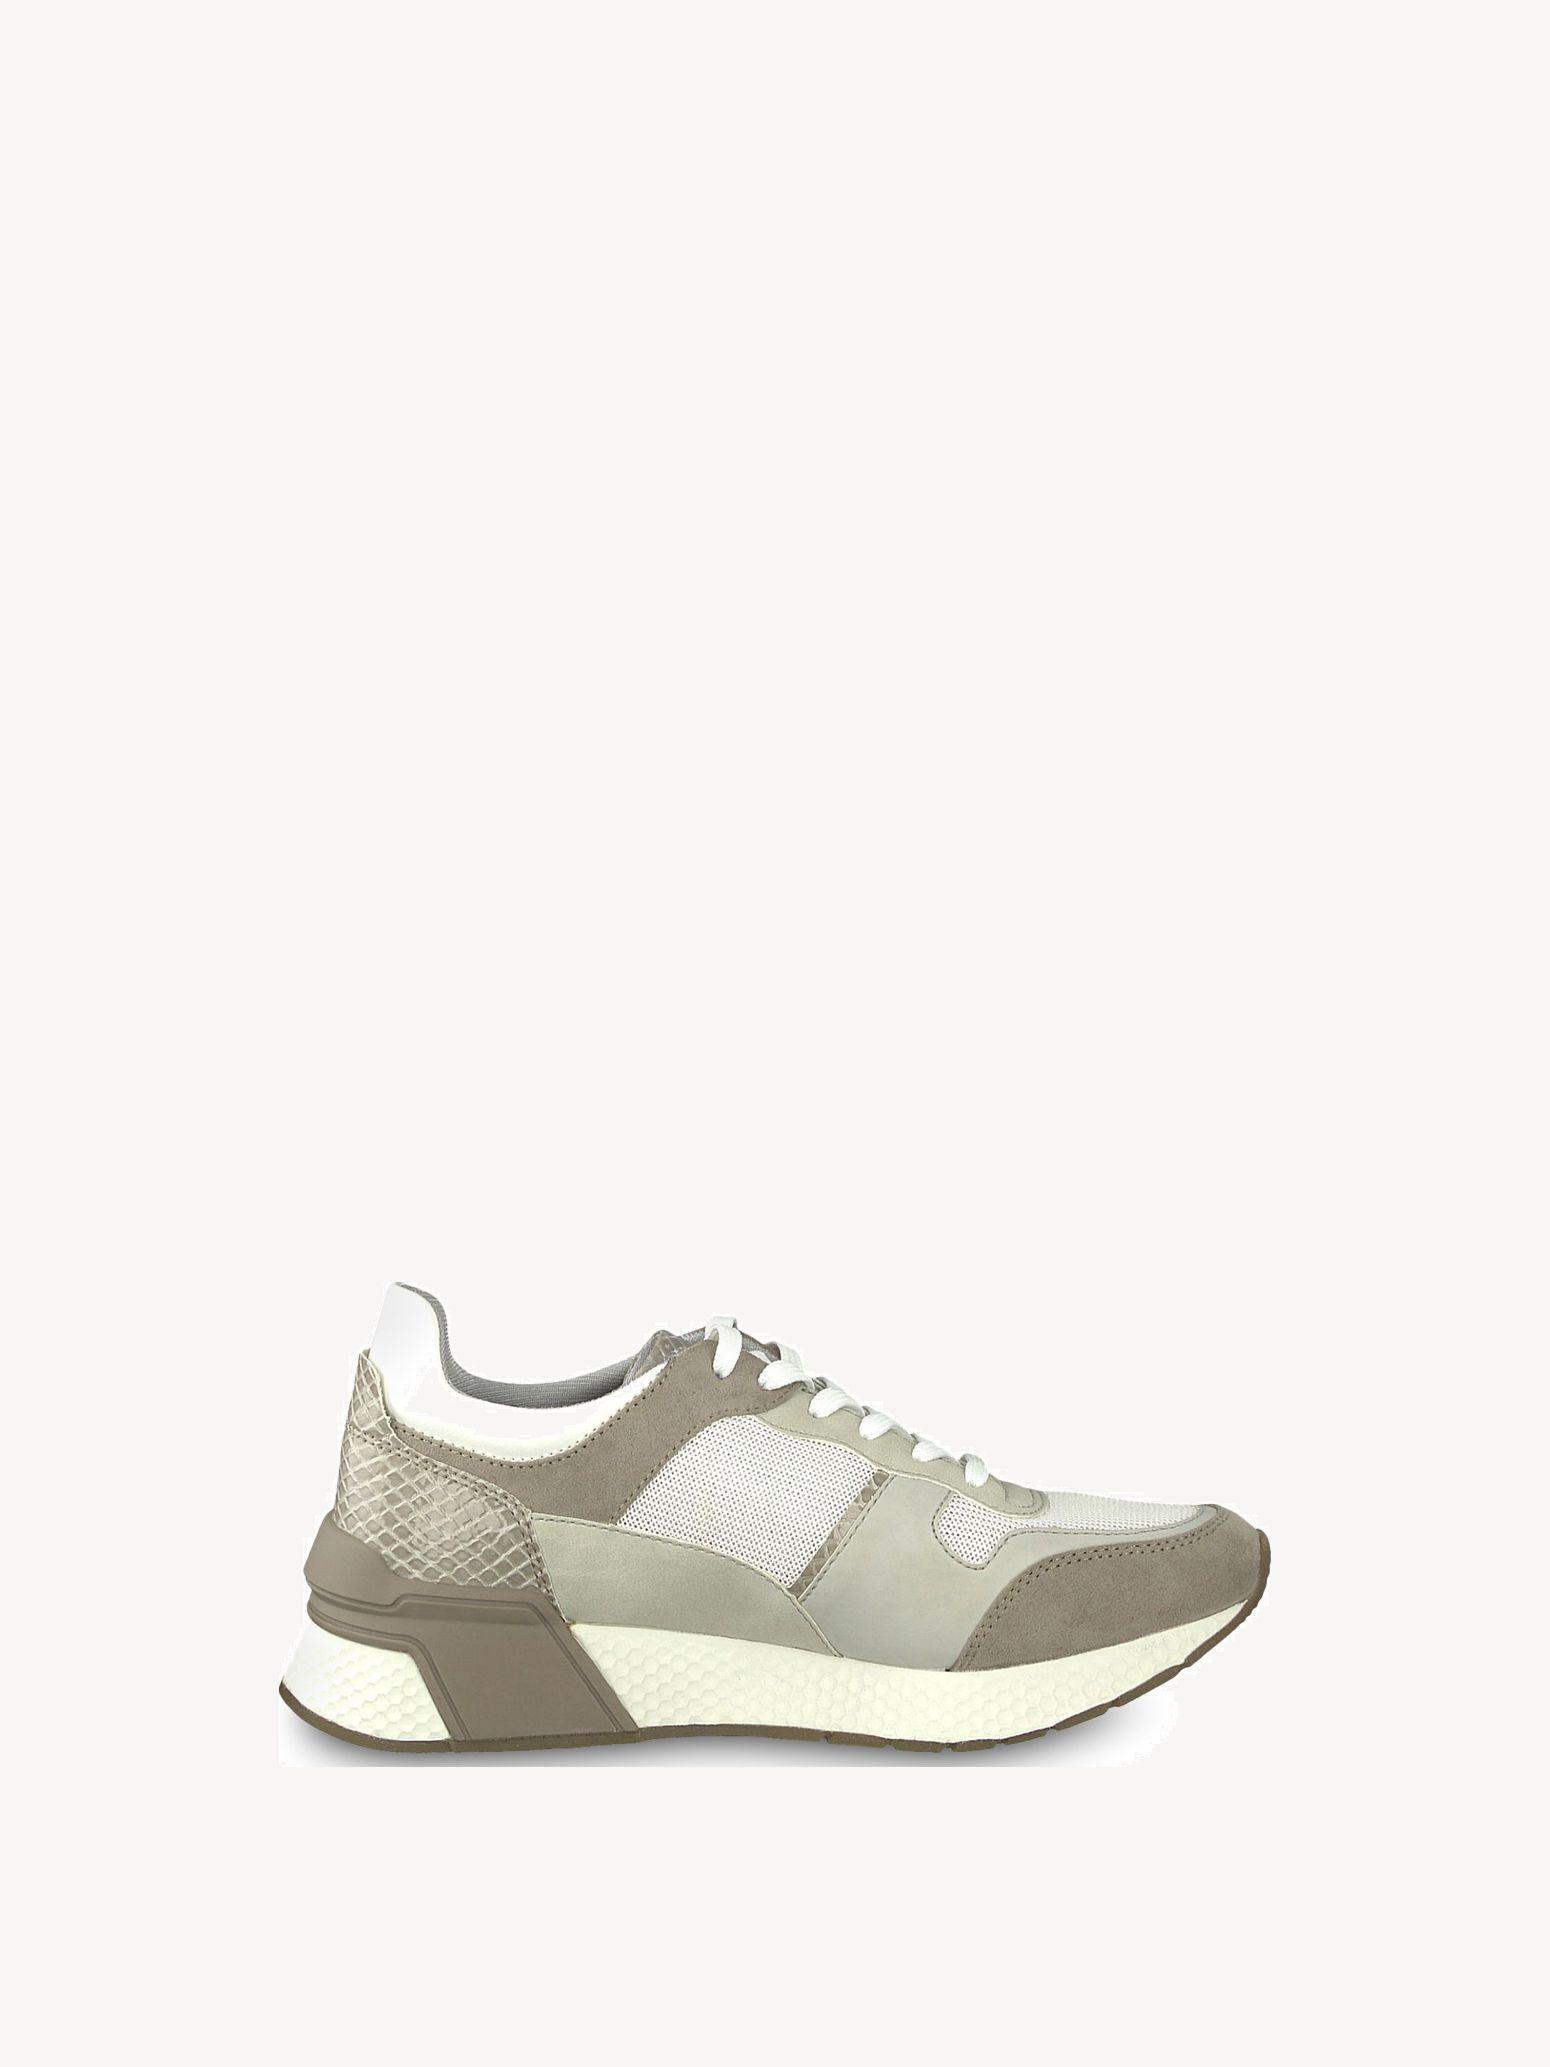 Penola 1 1 23706 20 344 37: Buy Tamaris Sneakers online!